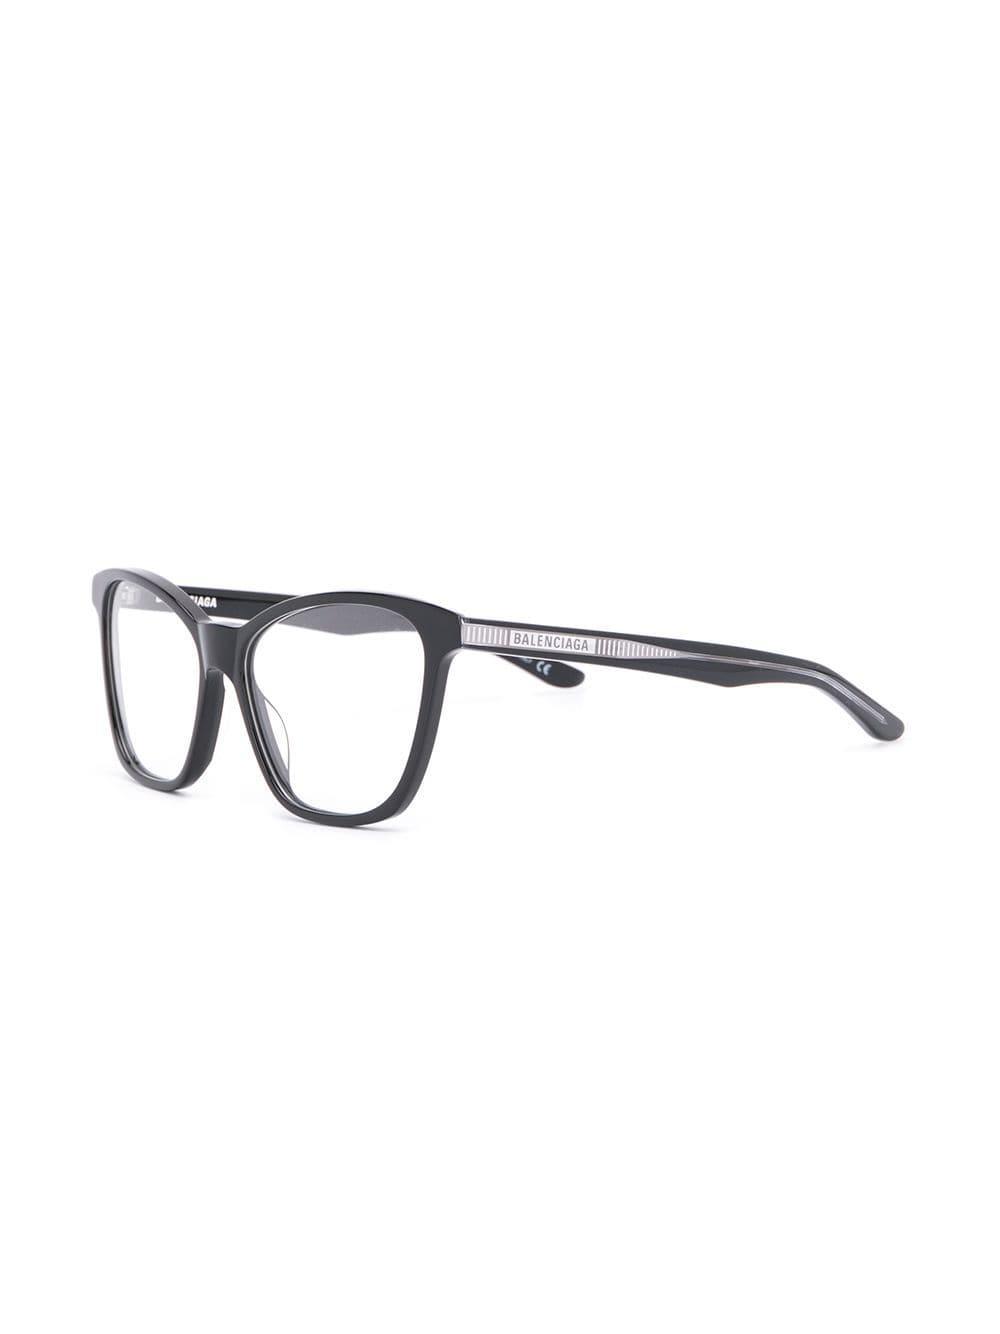 fdd566bc4c2 Balenciaga - Black Square Frame Glasses - Lyst. View fullscreen